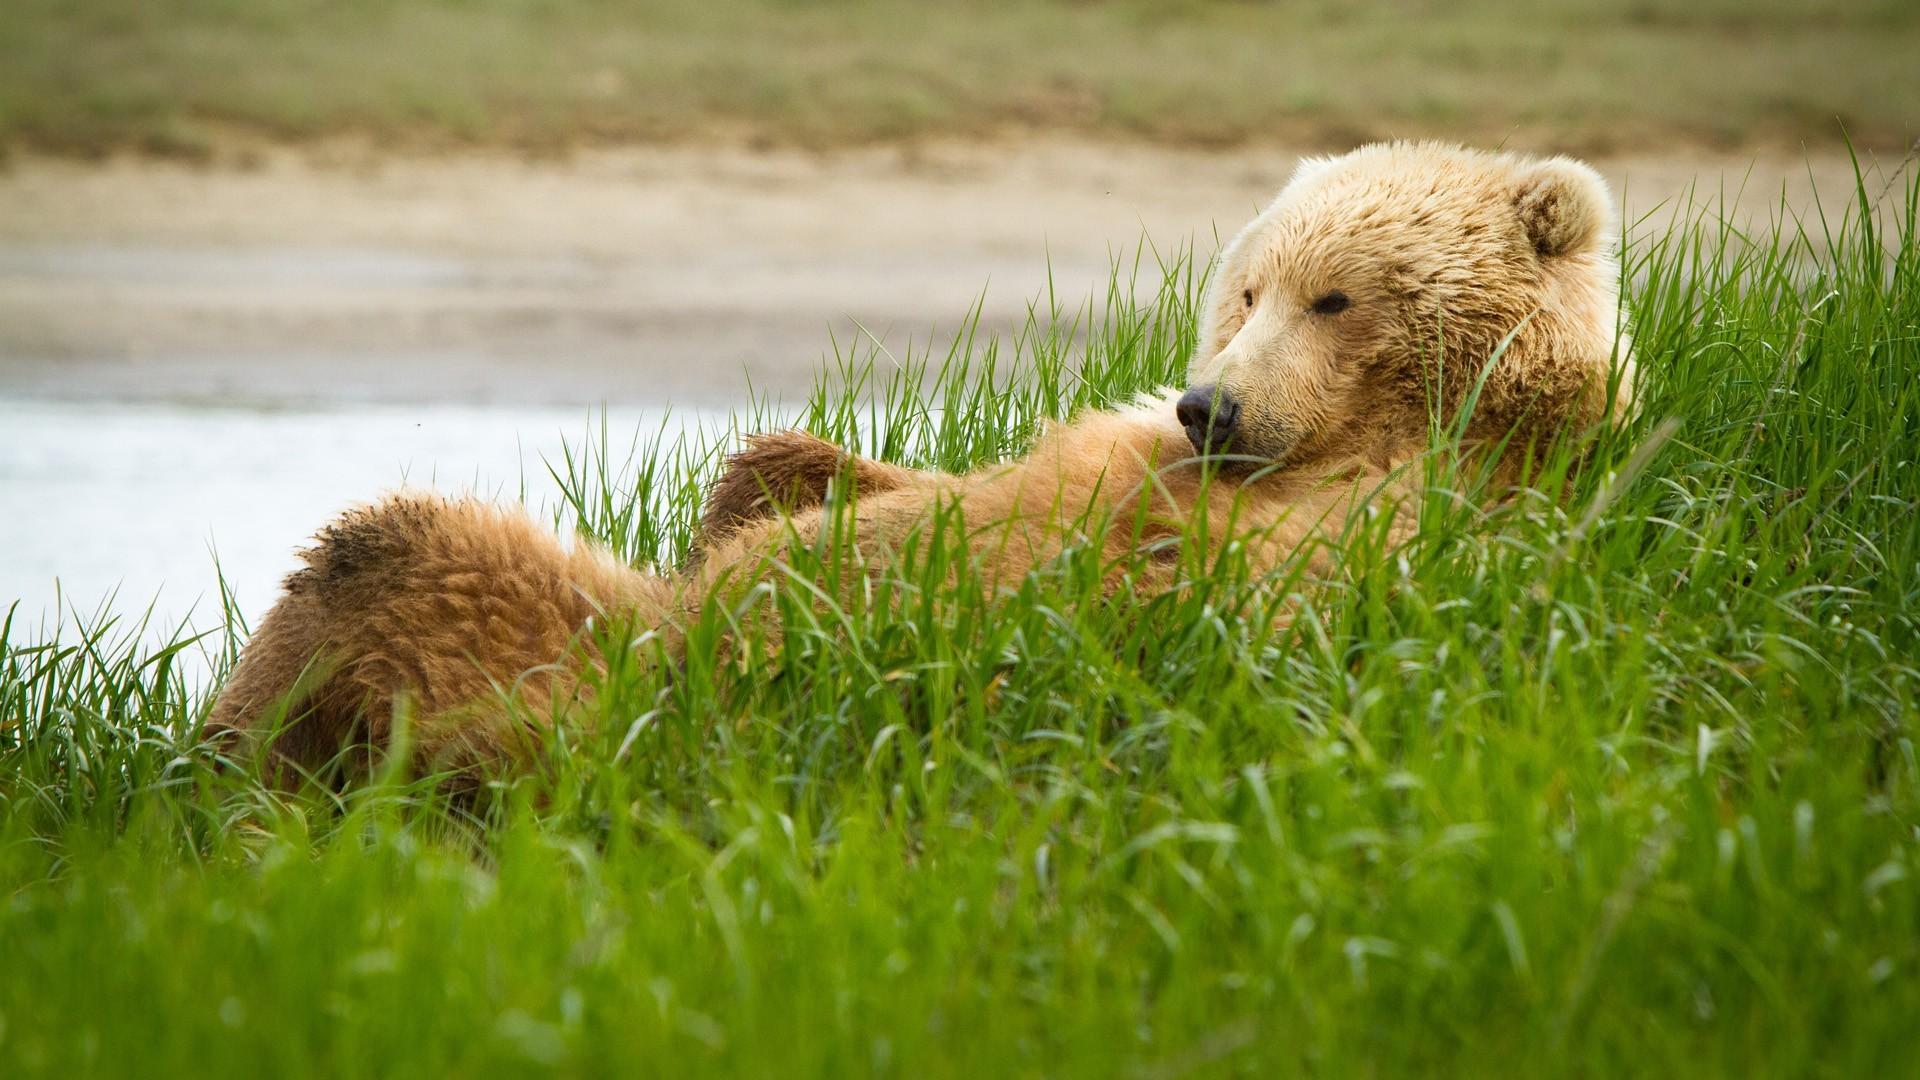 Grass Wildlife Grizzly Bear Brown Lie Grassland Funny Fauna Mammal Lawn Vertebrate